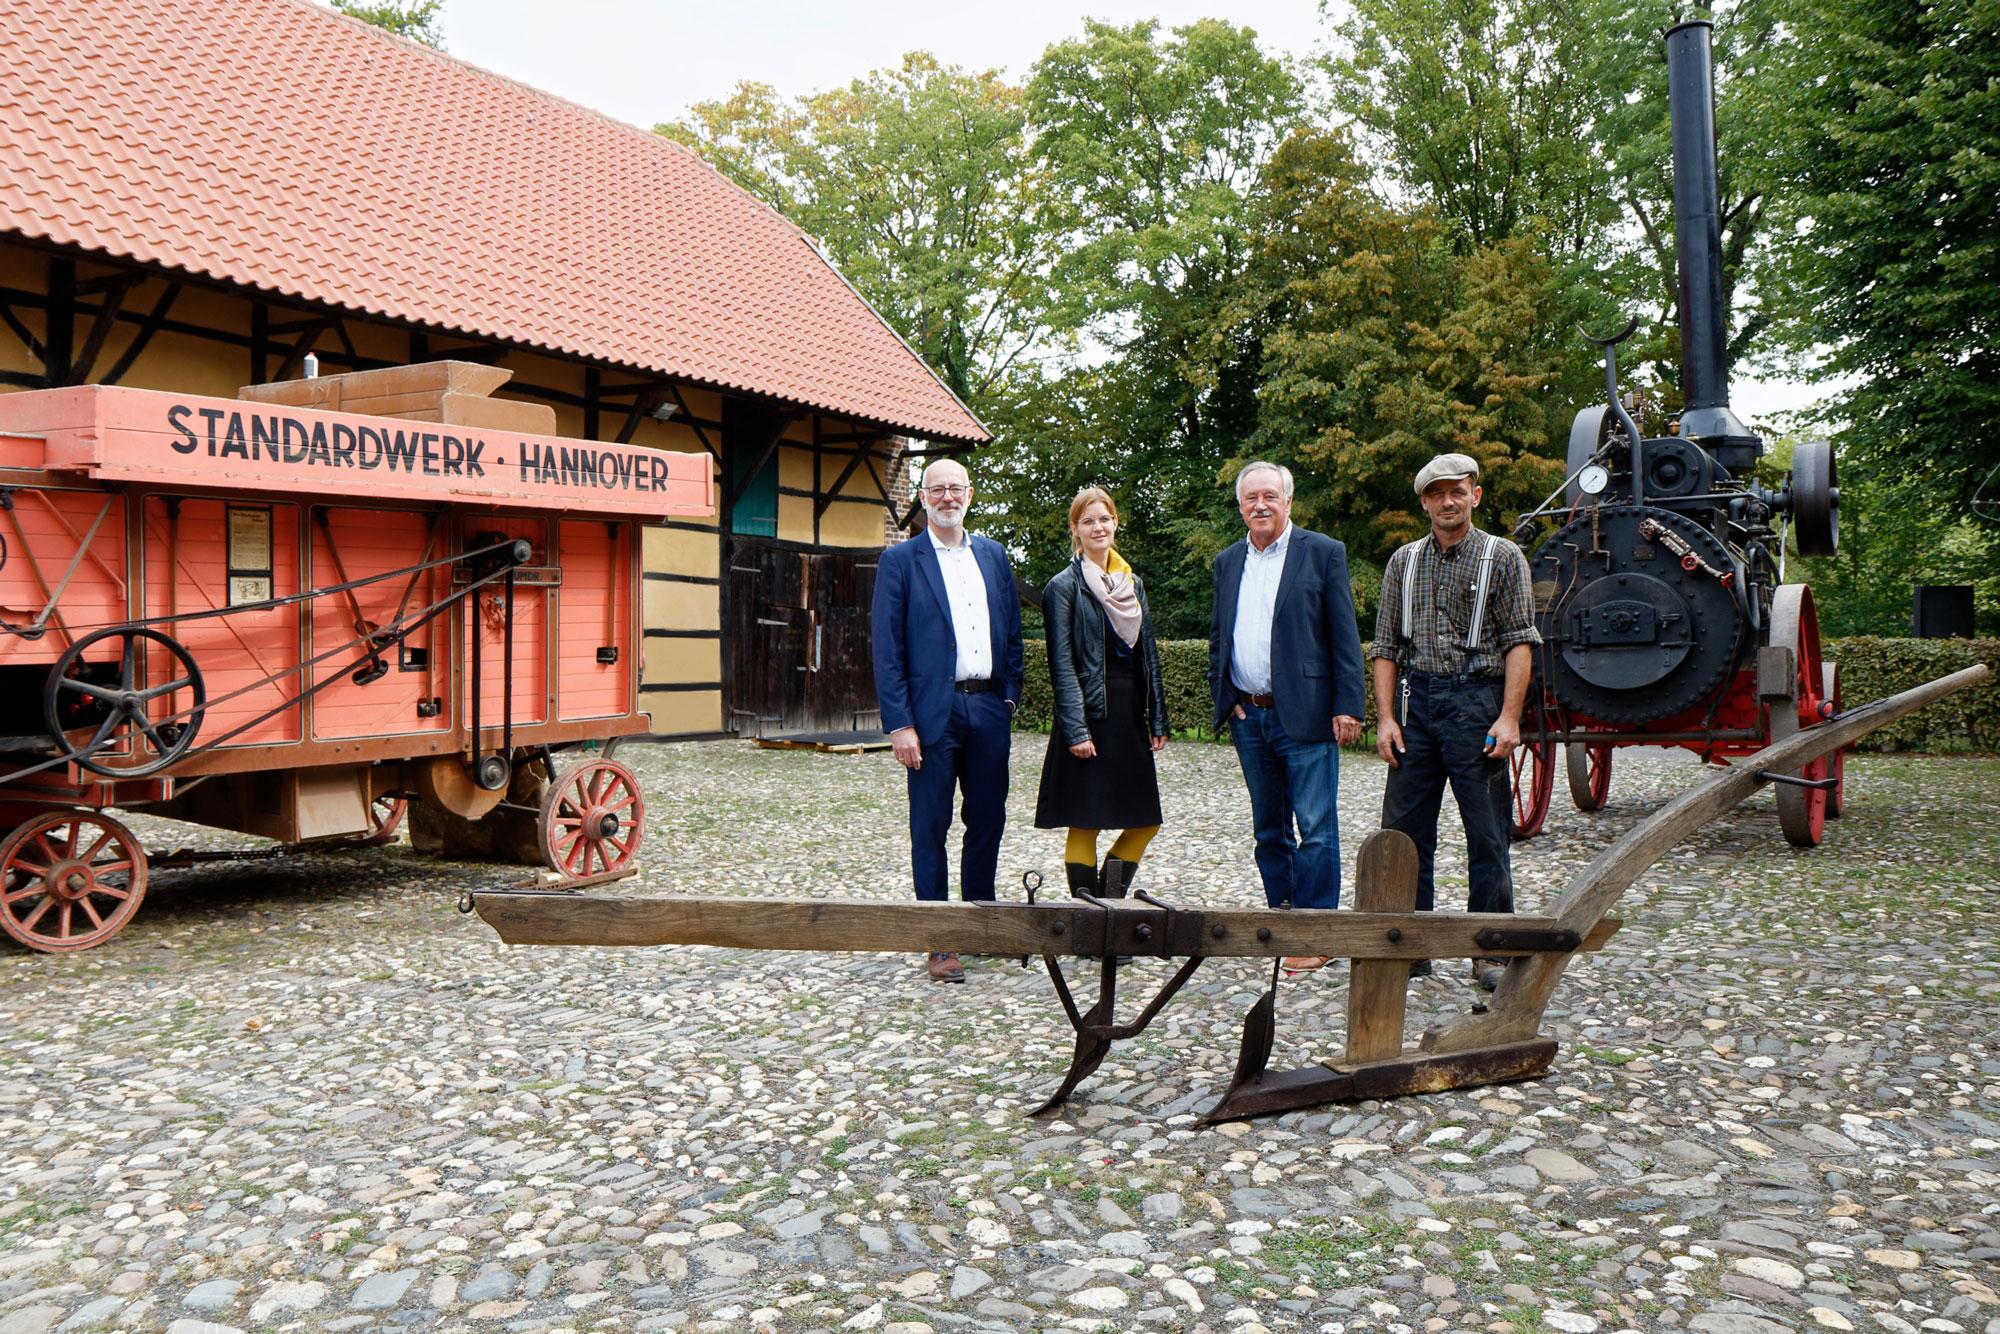 Museumsleiterin Anke Petrat, Herbert Kättner, Vorsitzender des Museumsvereins, sowie Peter Hormann, bäuerliche Fachkraft des Museums. (Foto: Kreis Viersen)